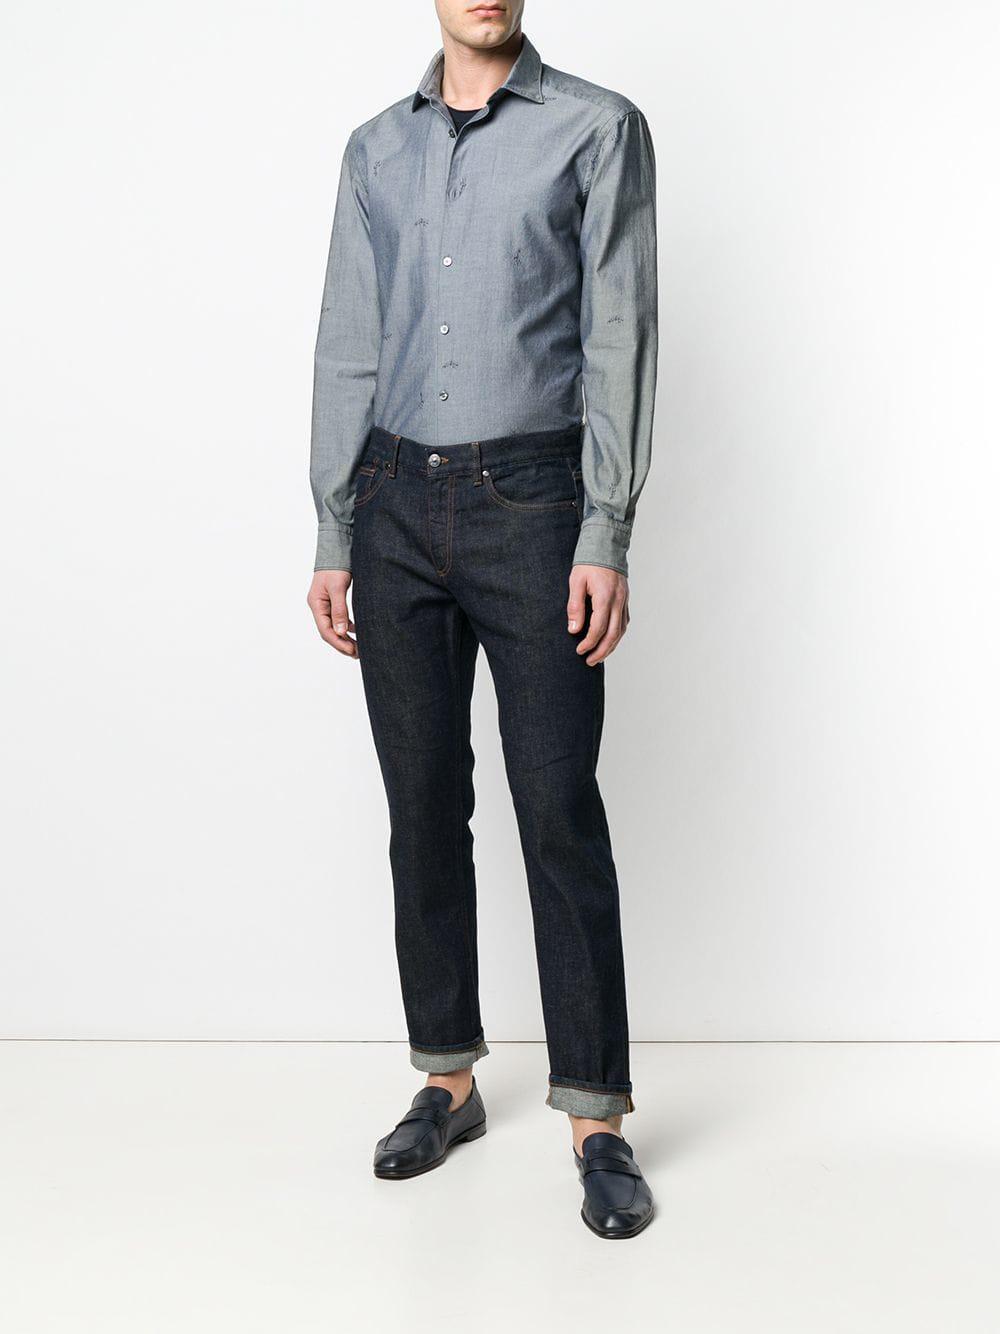 c870466a4c82a Lyst - Ermenegildo Zegna Straight-leg Jeans in Blue for Men